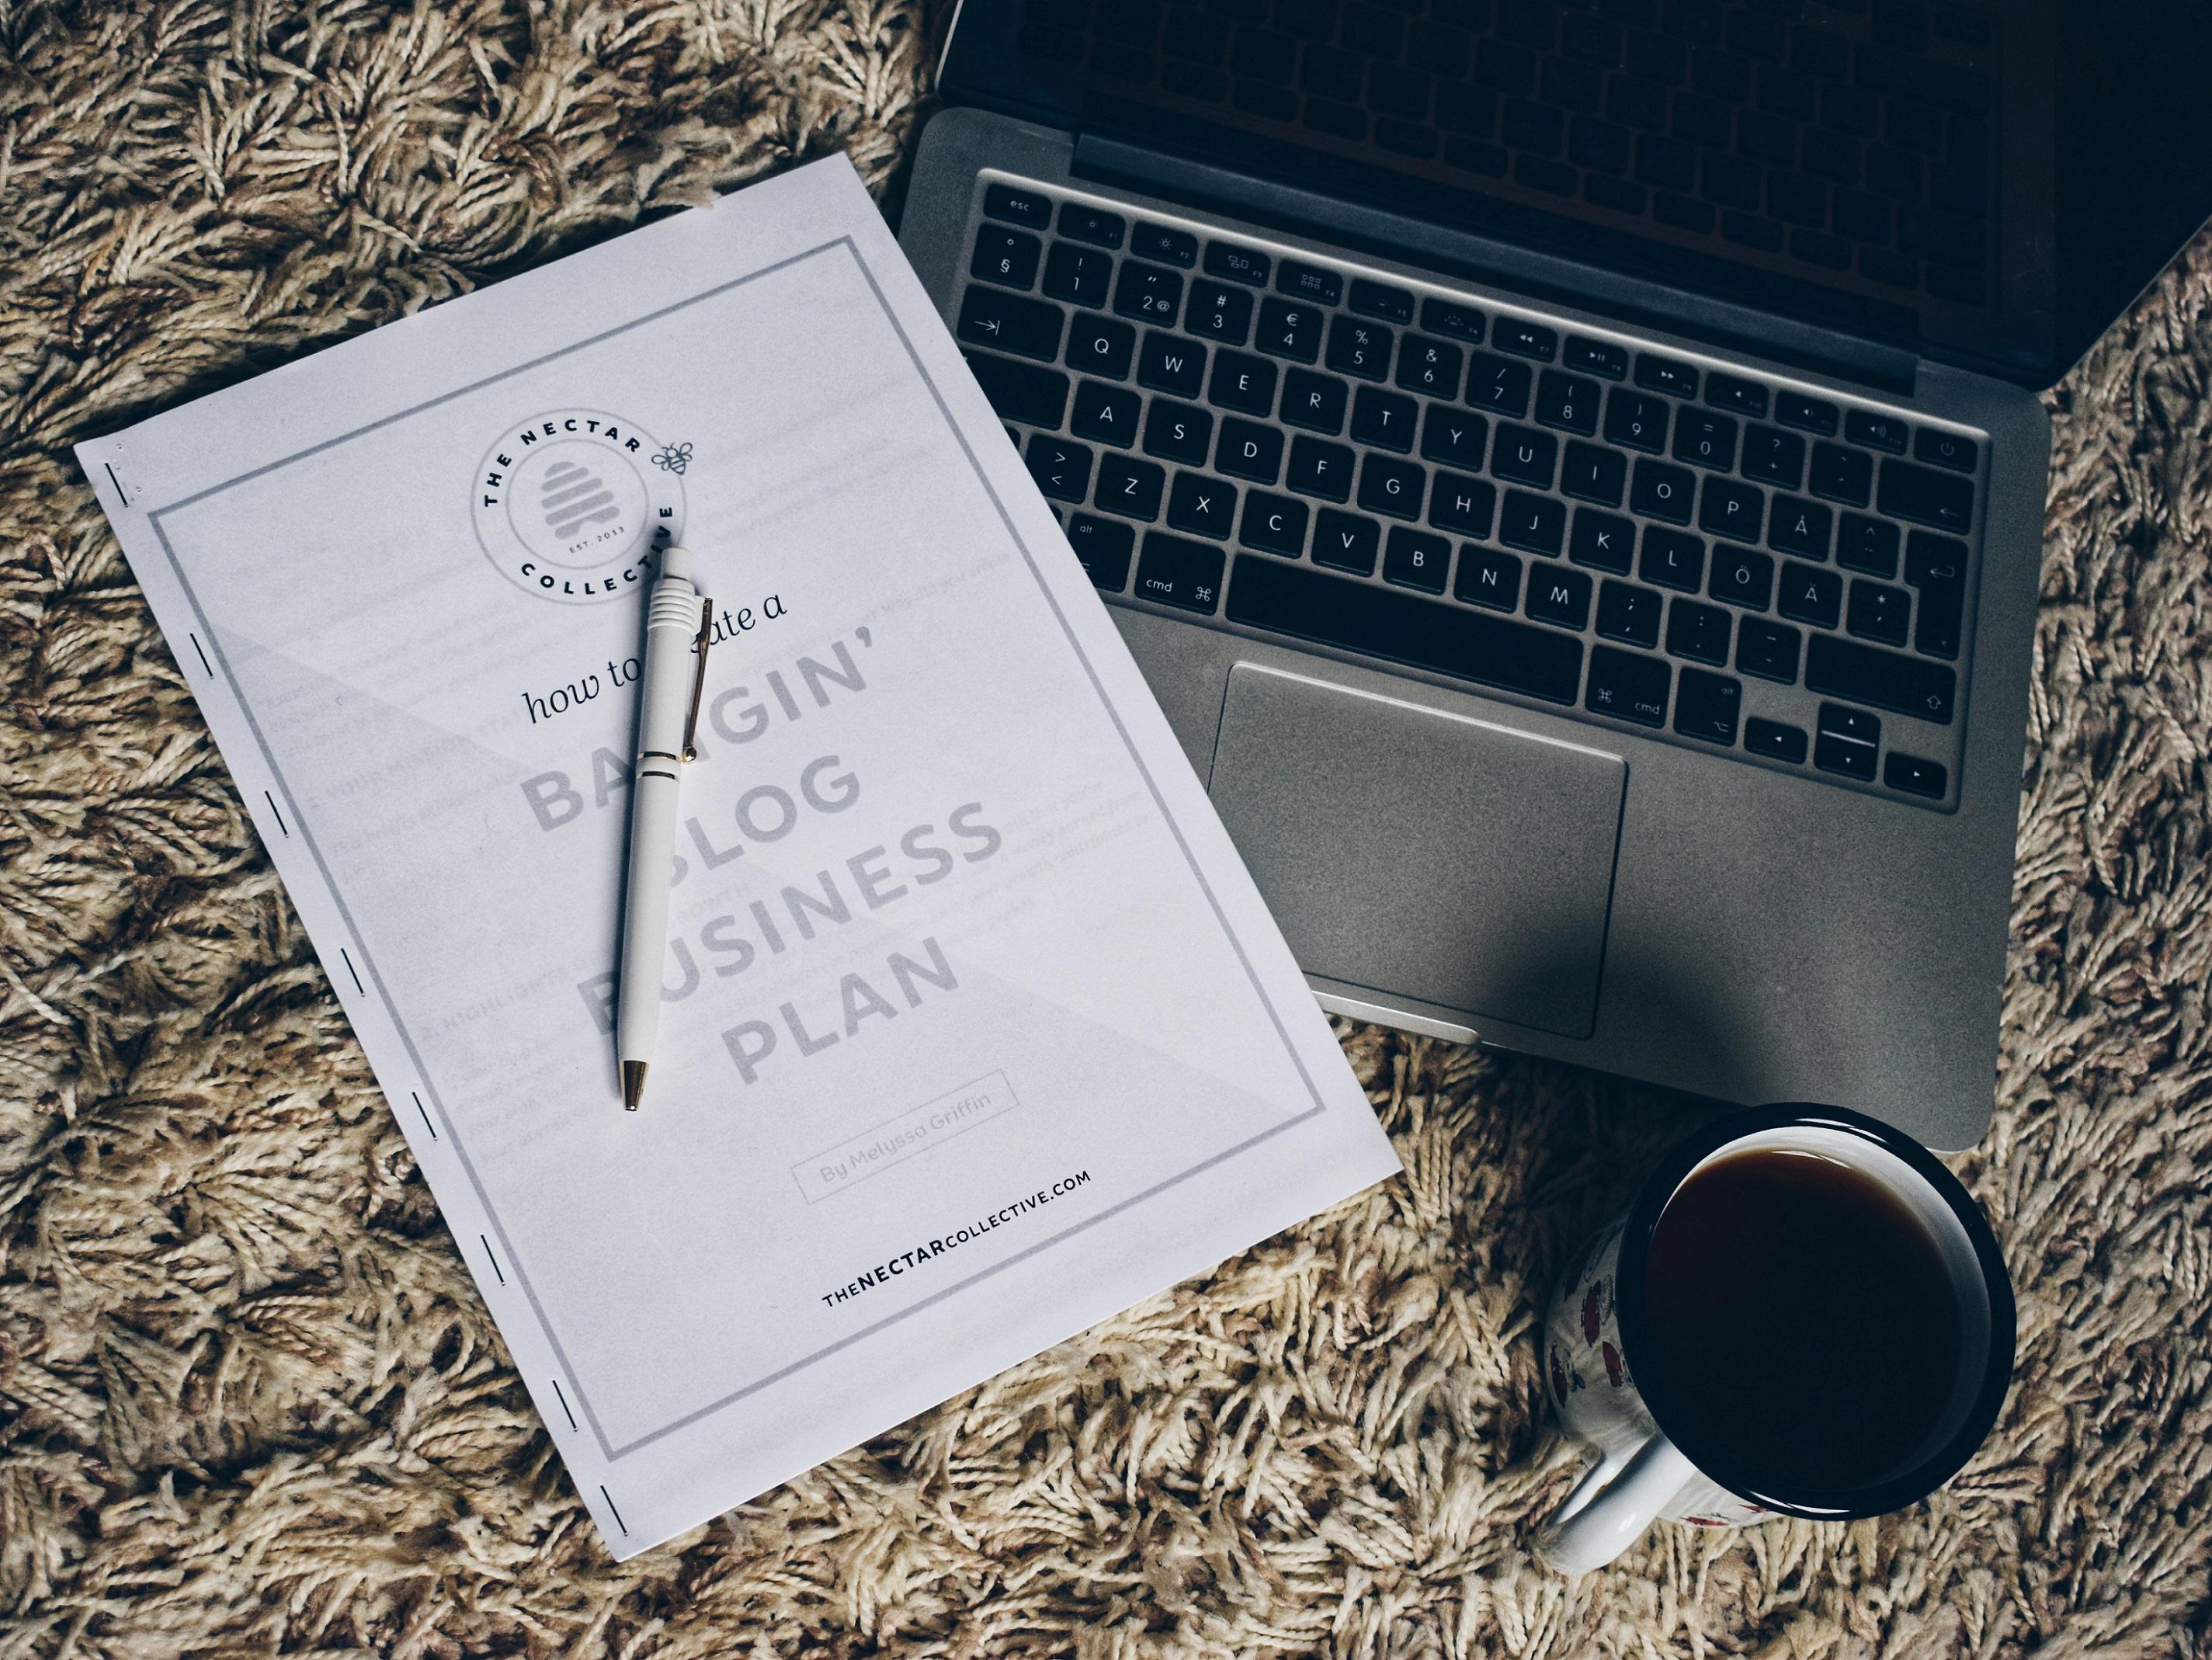 Outlandish blog Changes Dreams Future Photography Challenge Business Plan